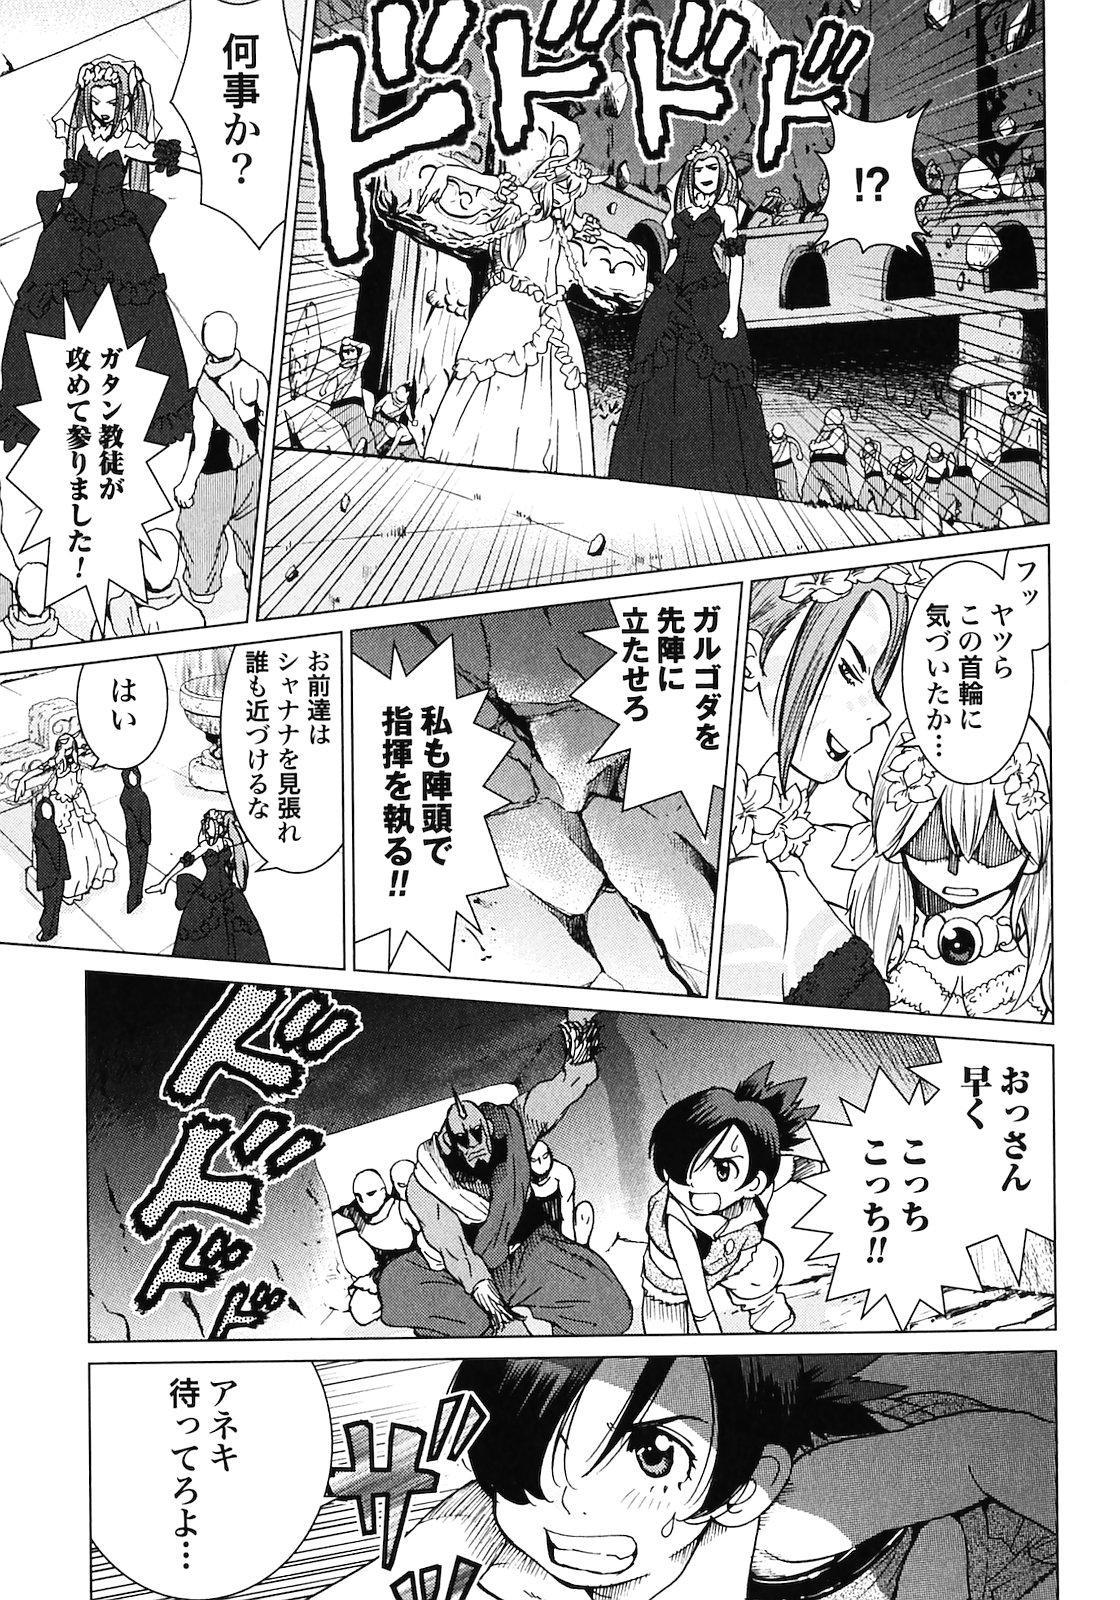 Makyo no Shanana Vol.02 136